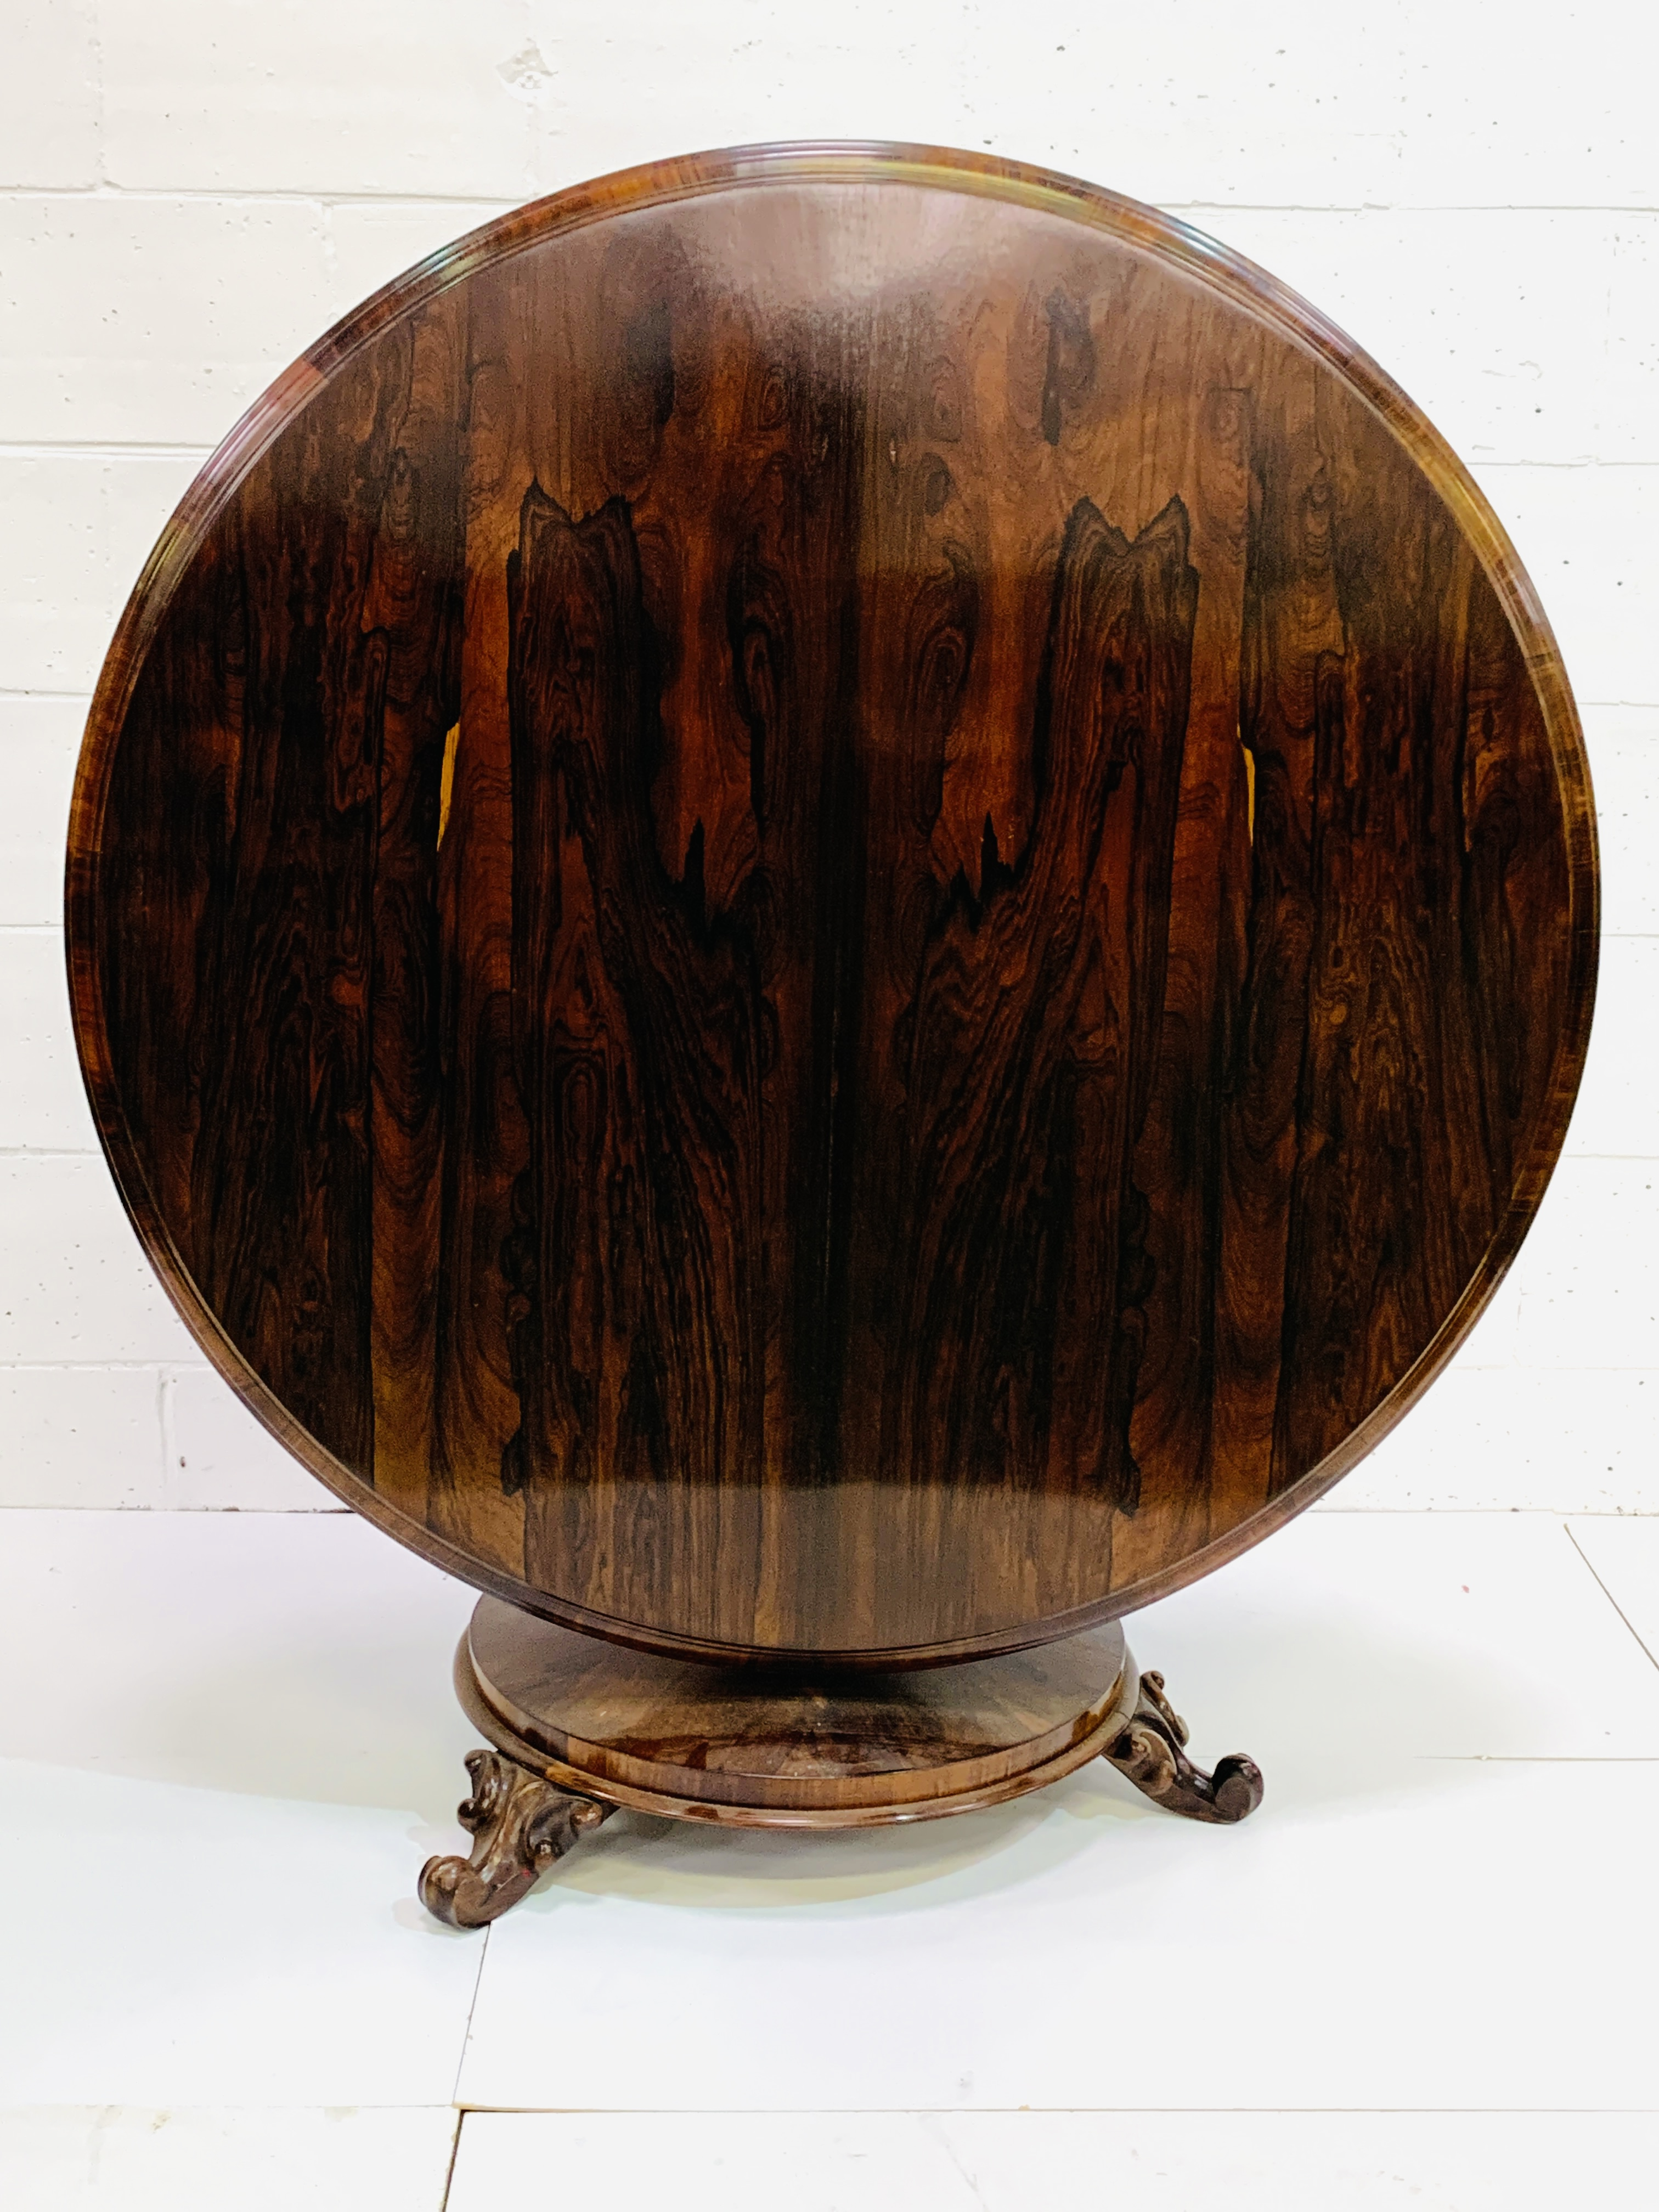 Victorian circular Rosewood tilt top table - Image 9 of 9